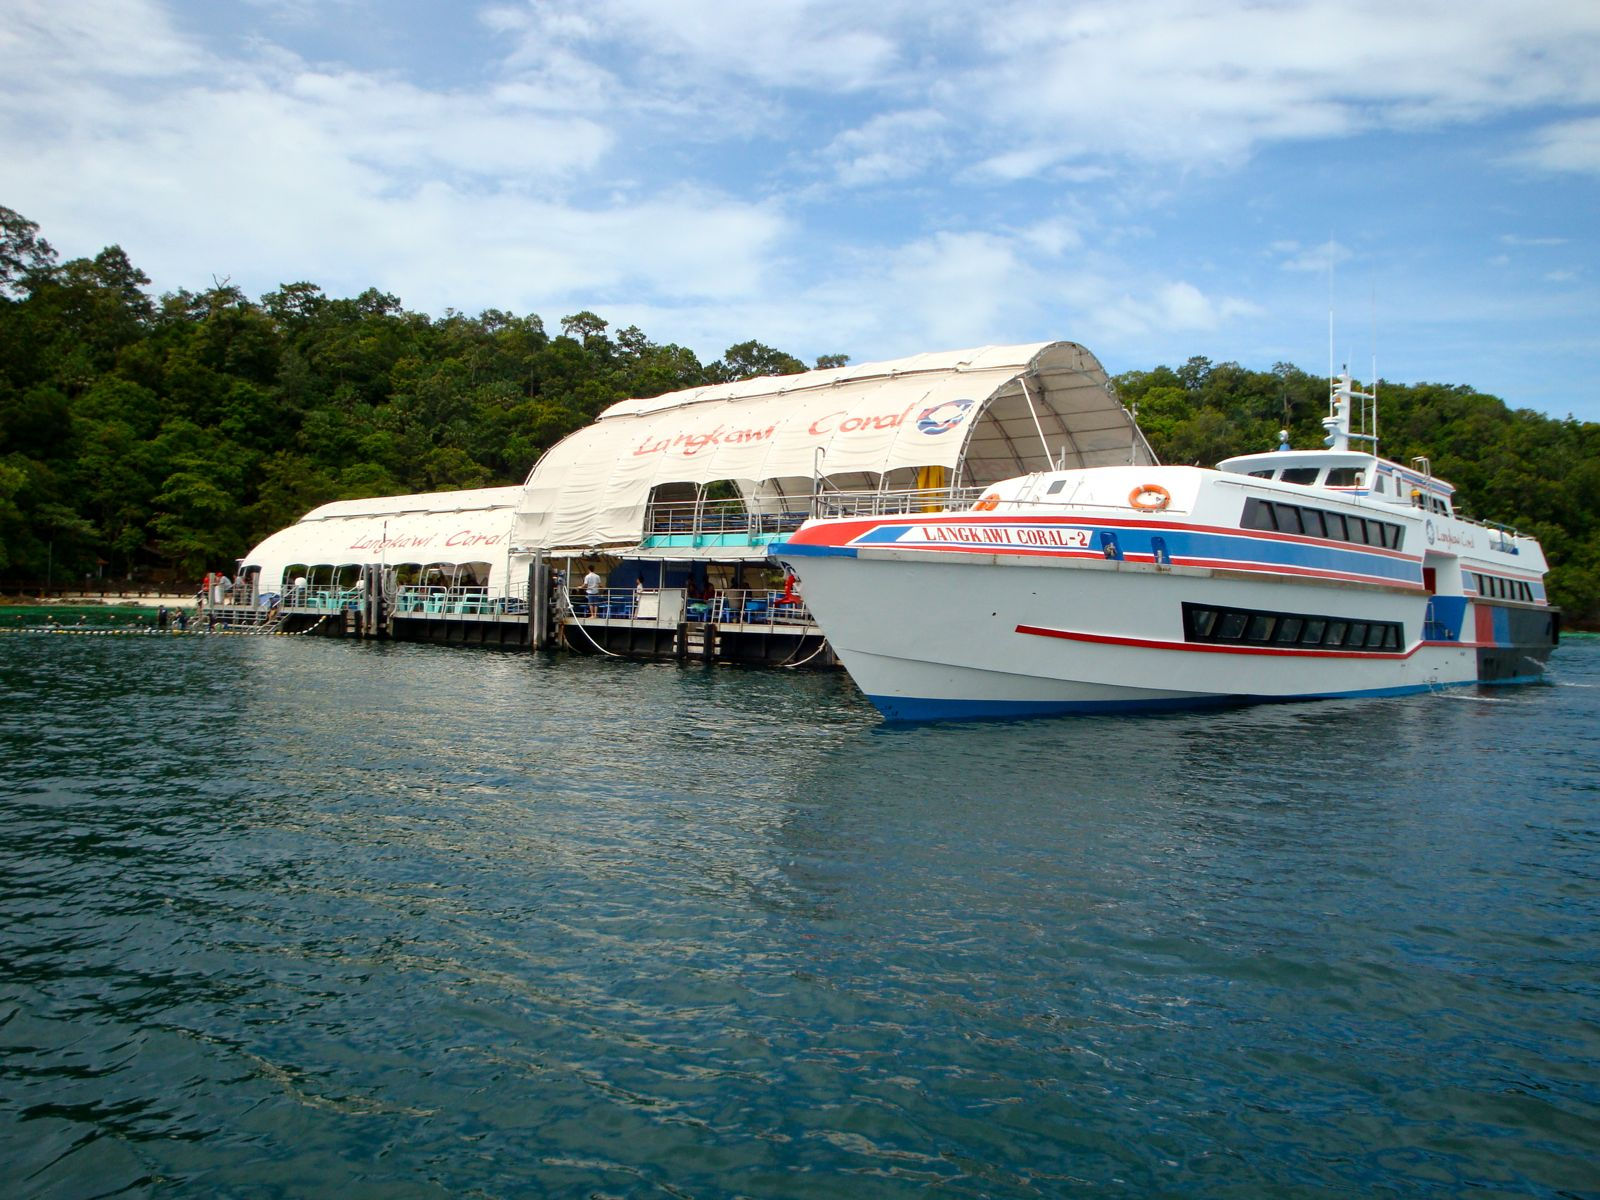 Pulau Payar Langkawi Island Blogspot Com